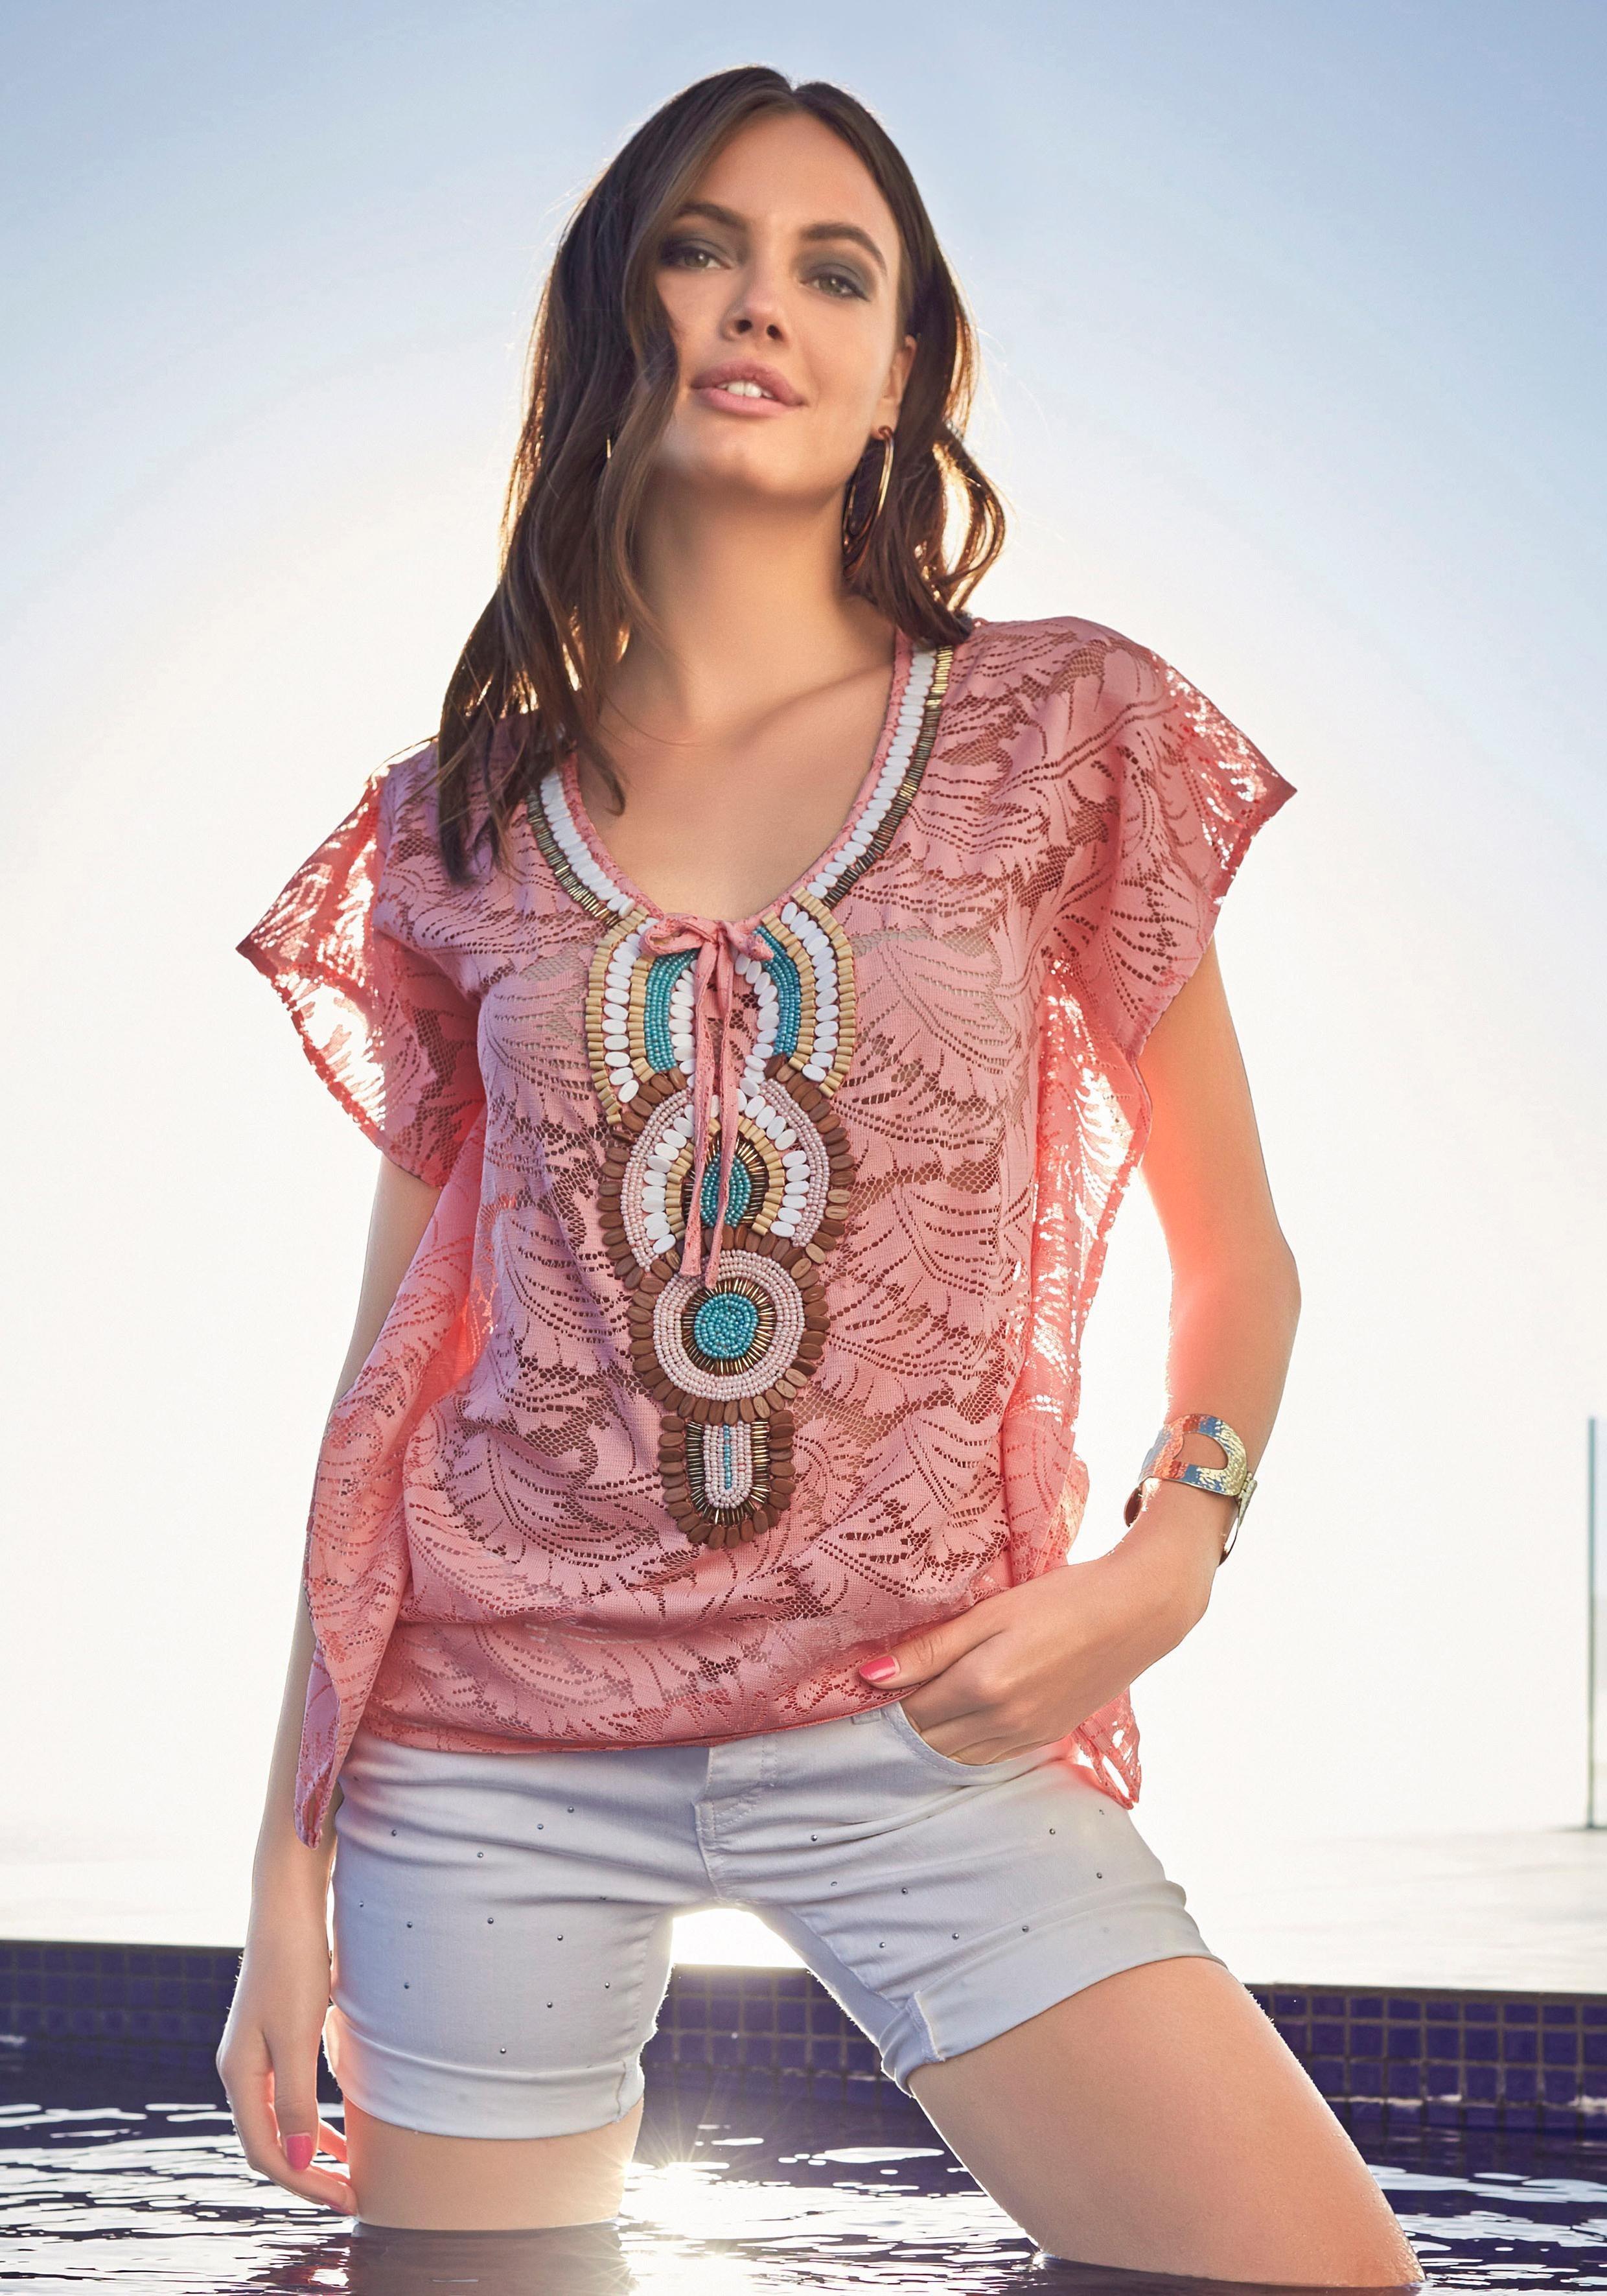 Melrose Tunika, aus Spitze mit großer Applikation | Bekleidung > Tuniken > Sonstige Tuniken | Melrose